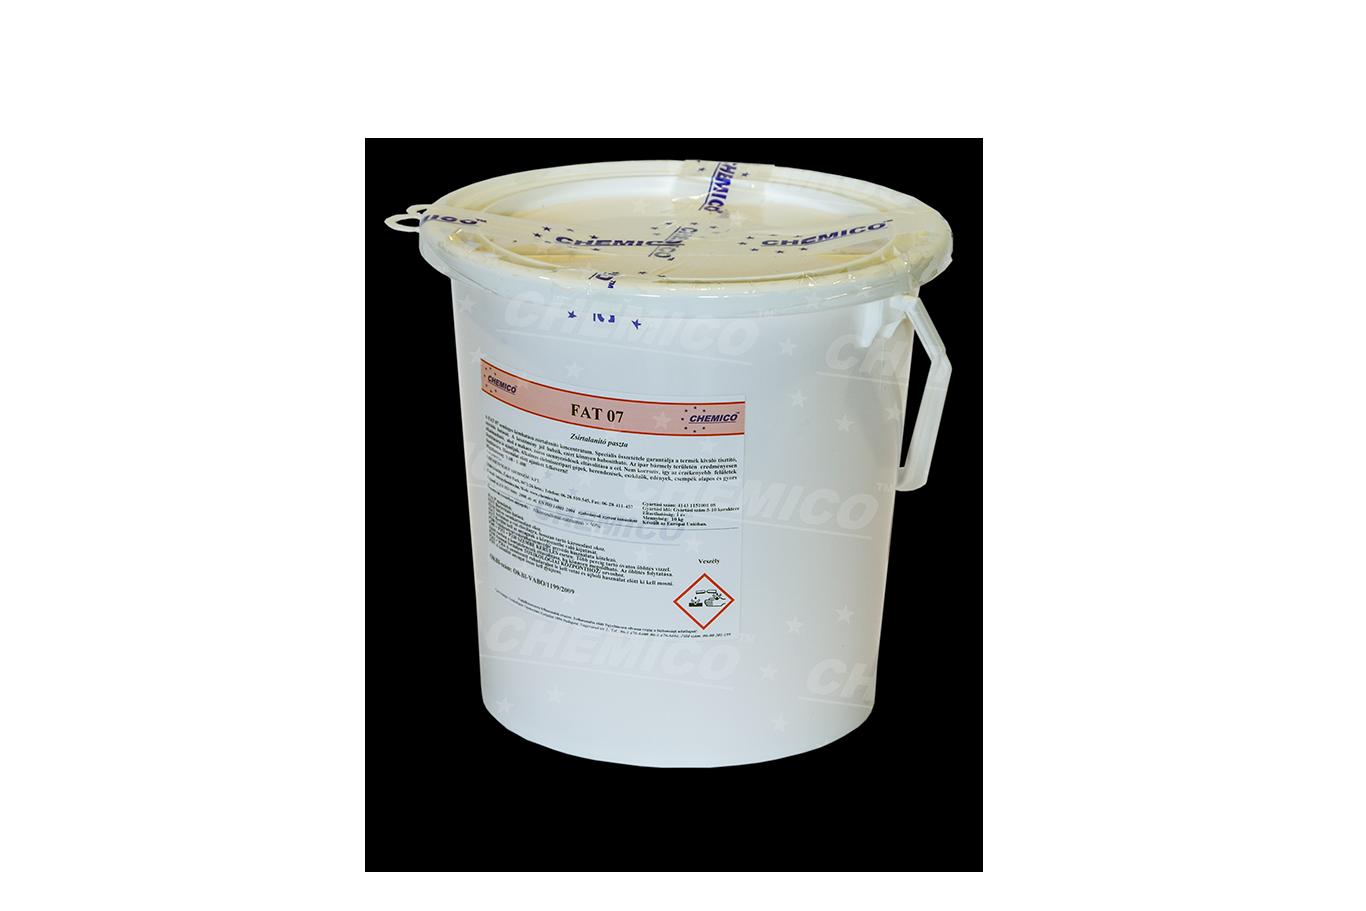 fat-07-paszta-zsiroldo-zsirtalanito-lugos-zsirbonto-ipari-chemico-10l